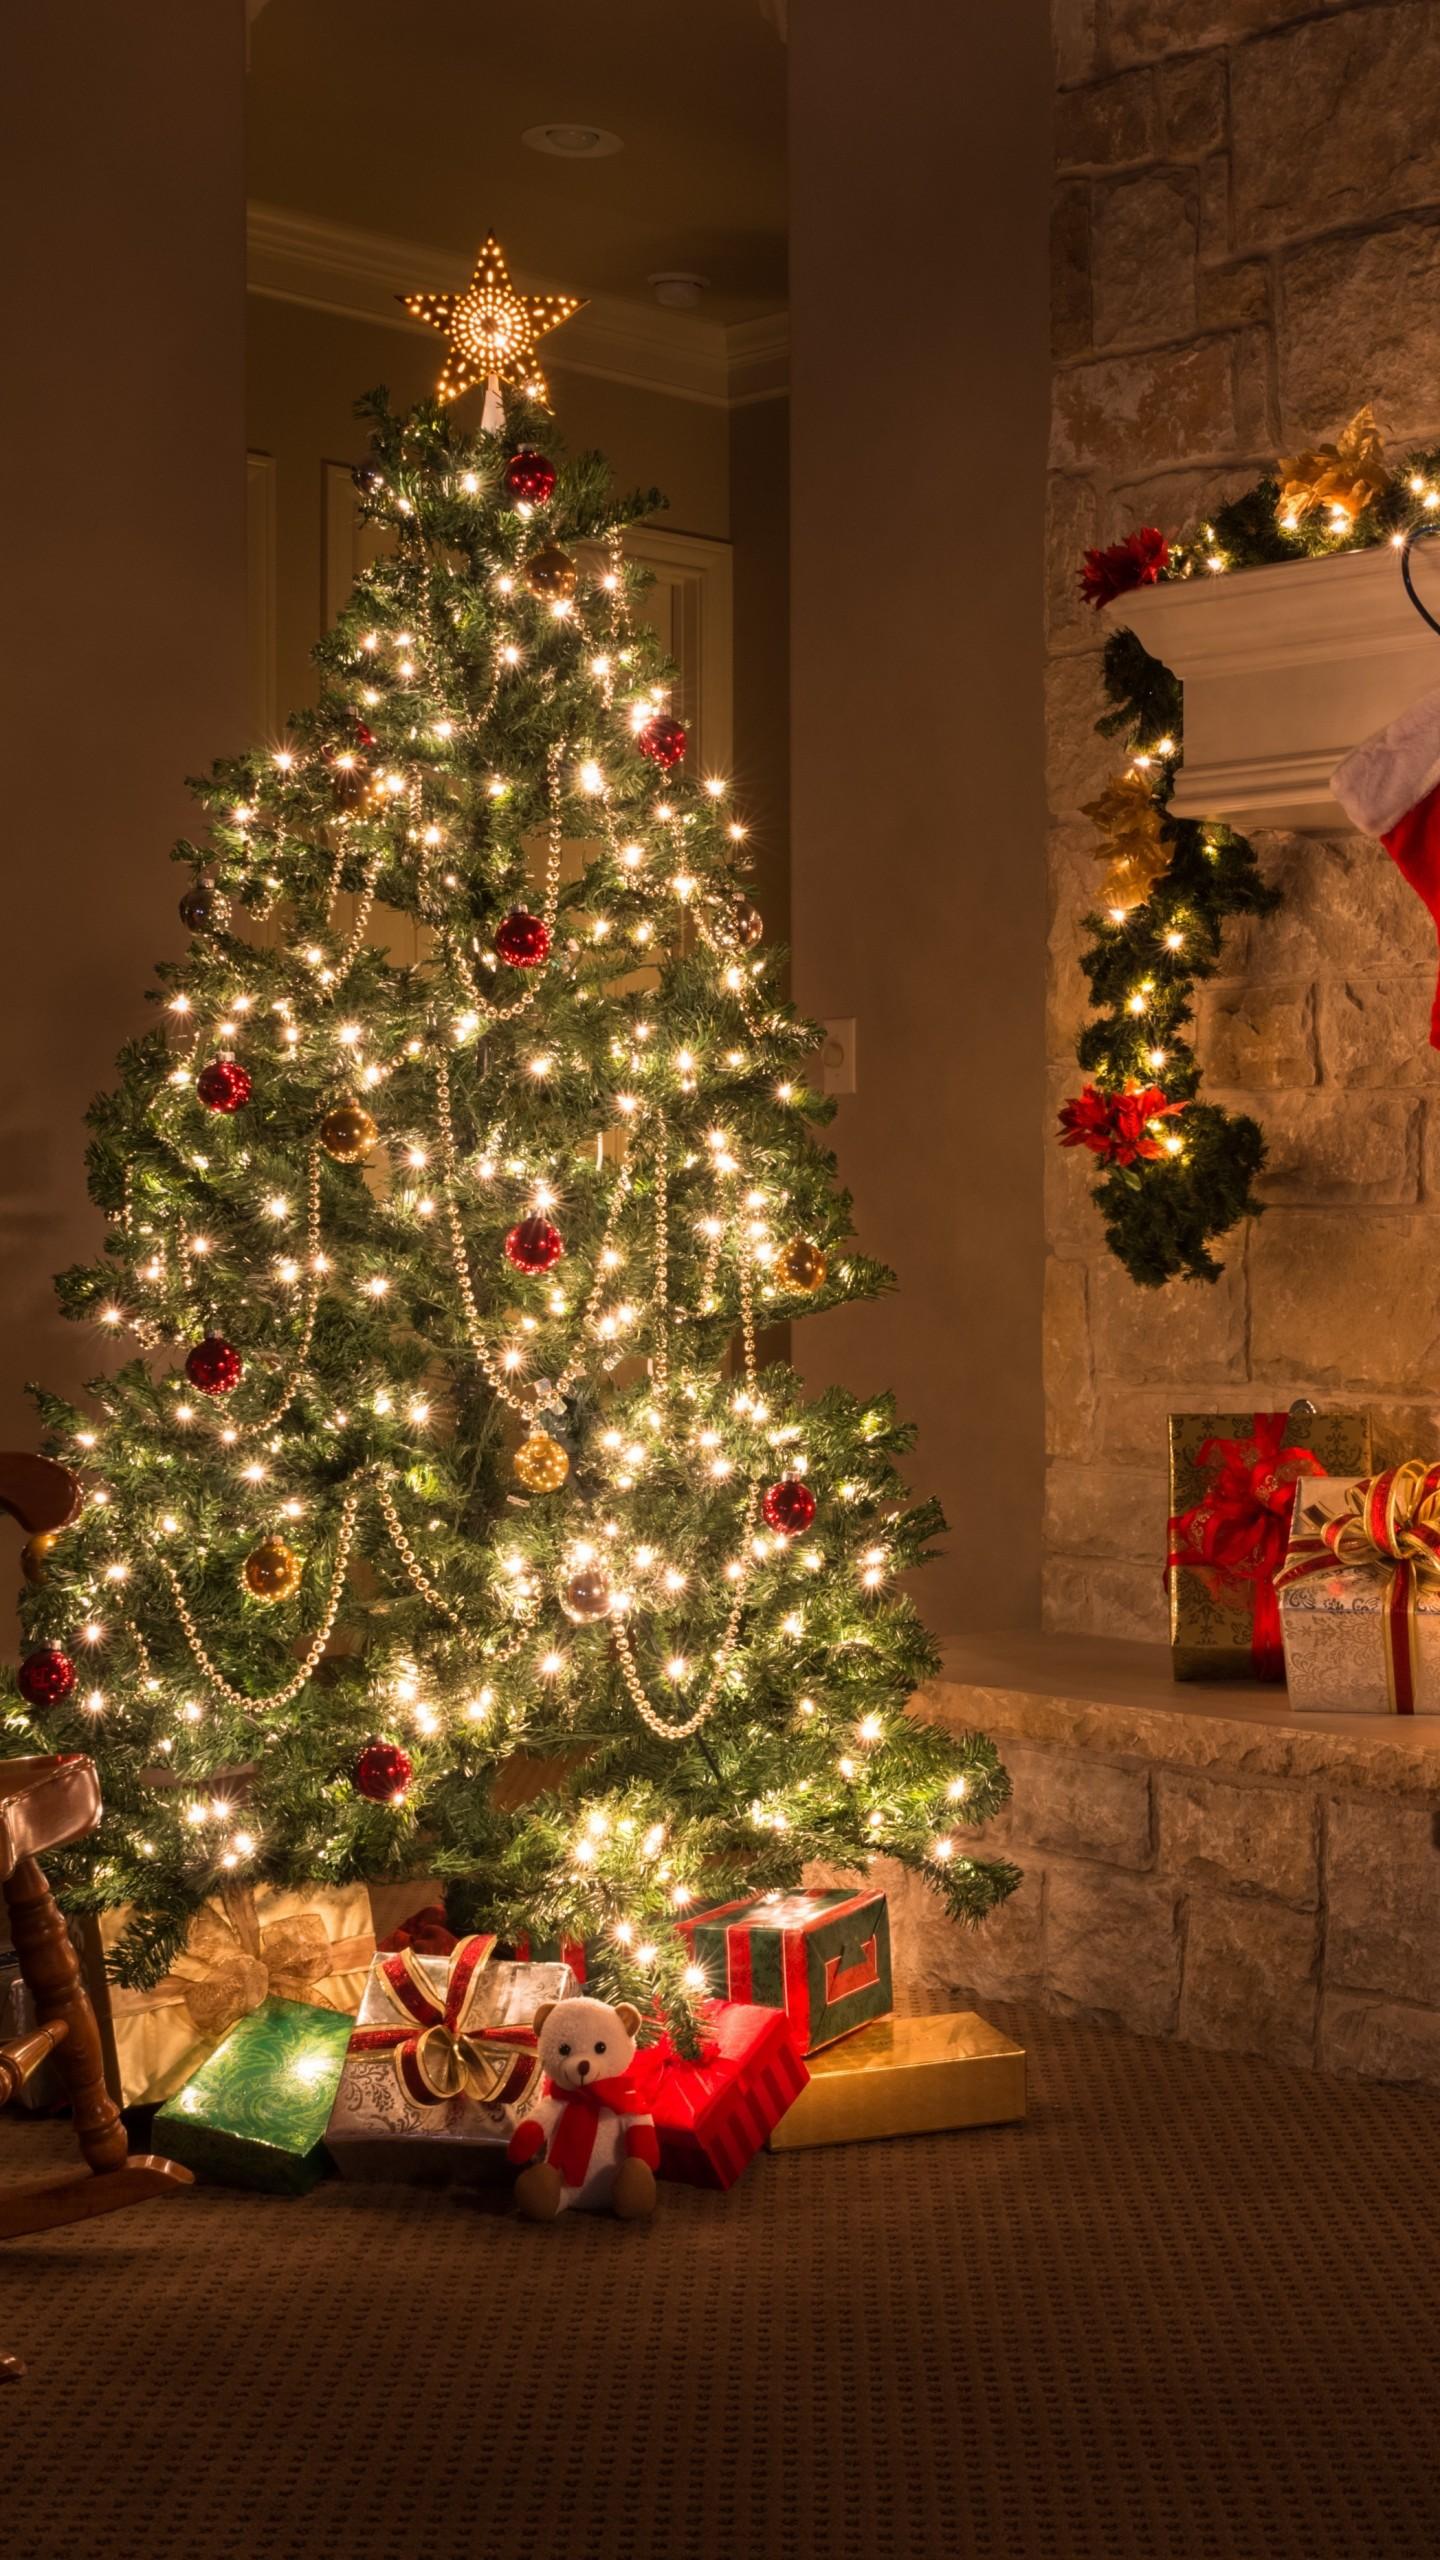 Christmas Santa Hd Wallpapers Wallpaper Christmas New Year Gifts Fir Tree Fireplace